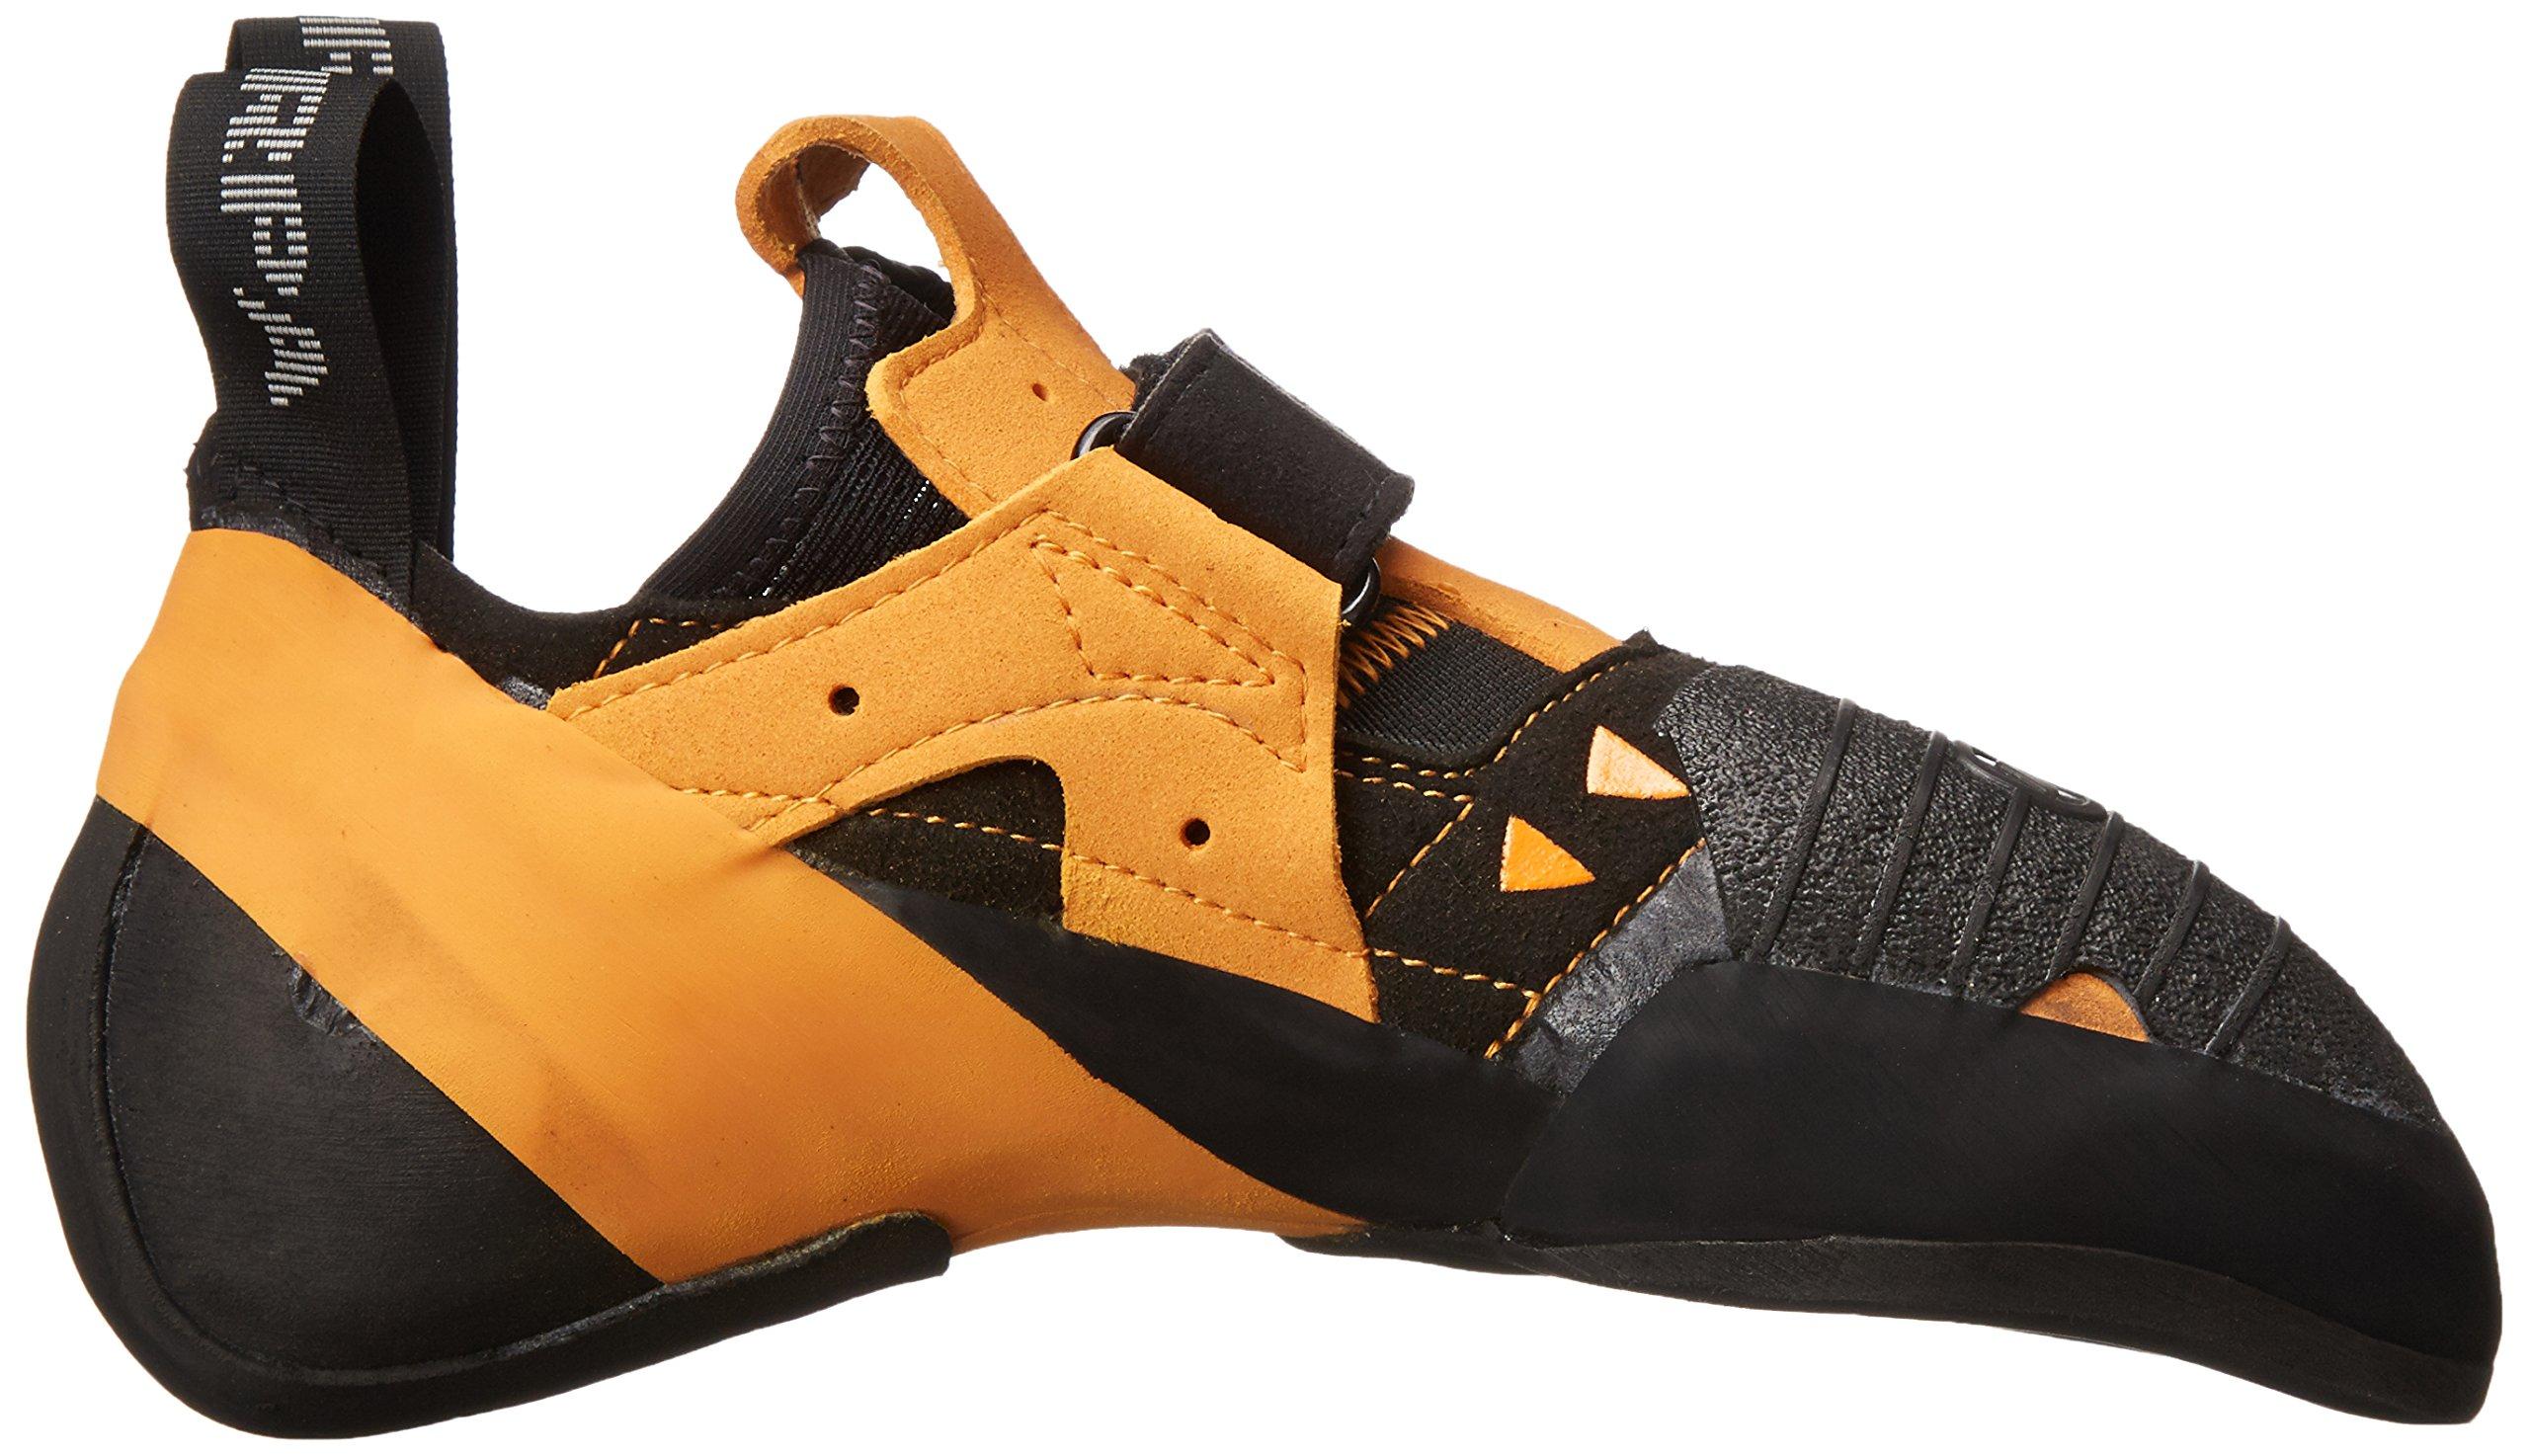 Scarpa Men's Instinct VS Climbing Shoe by SCARPA (Image #7)